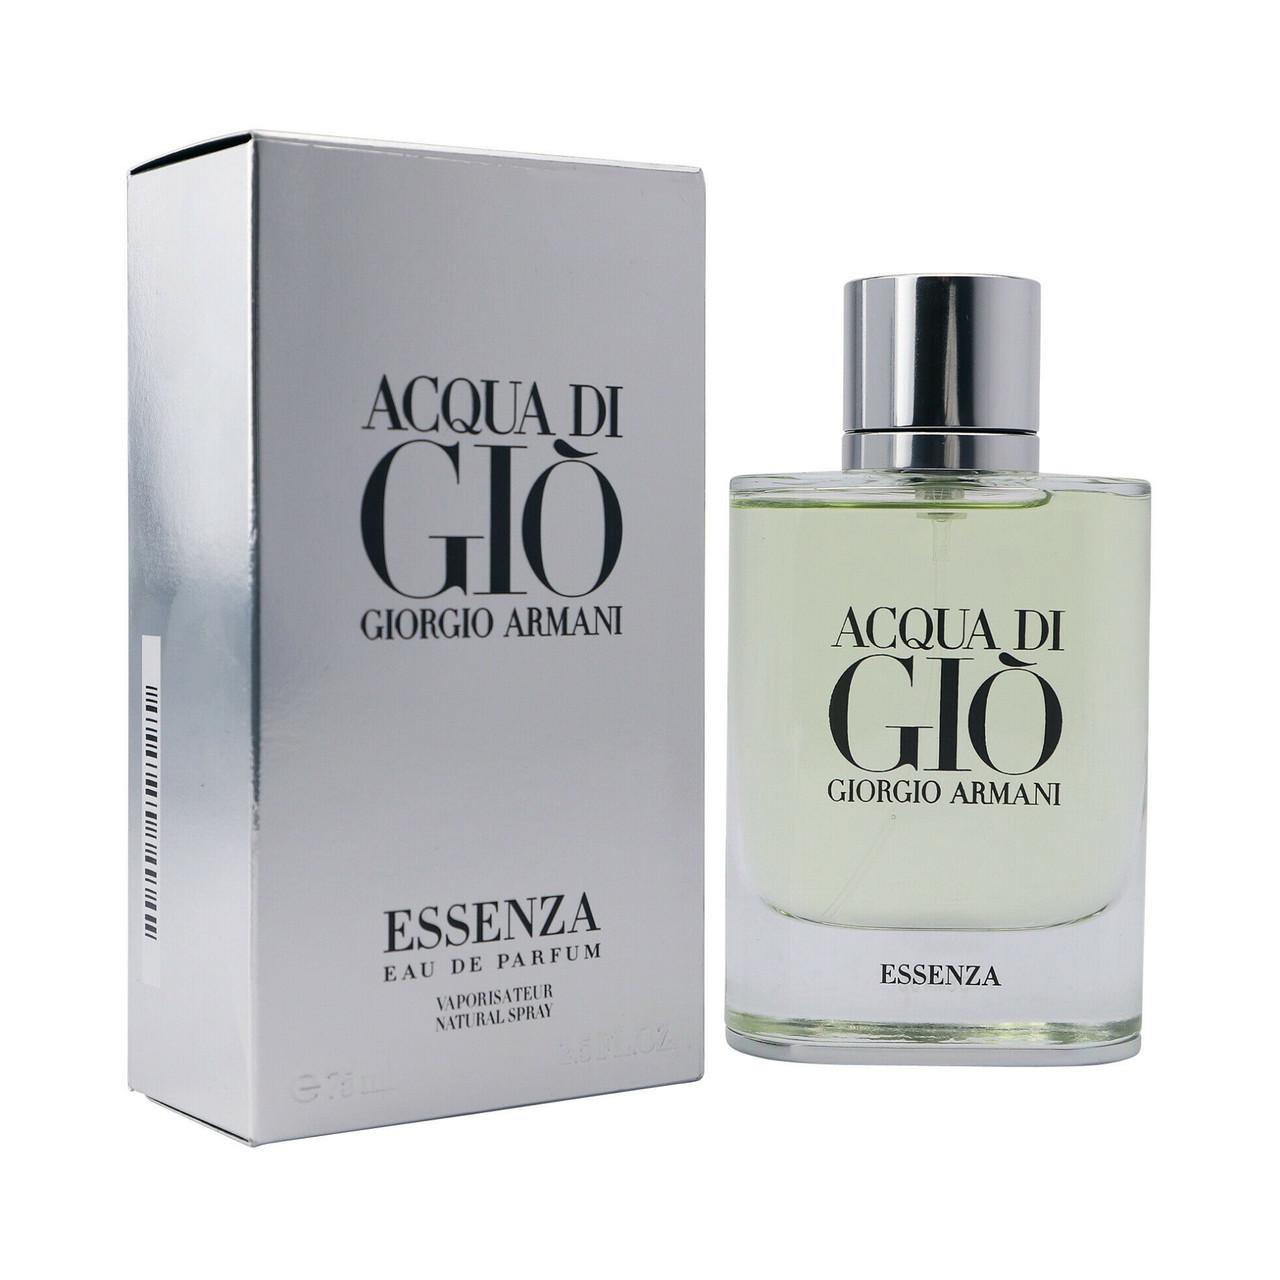 GIORGIO ARMANI  Acqua di Gio Essenza ( Армани Аква Ди Джио Эссенза) парфюмированная  вода - 75ml